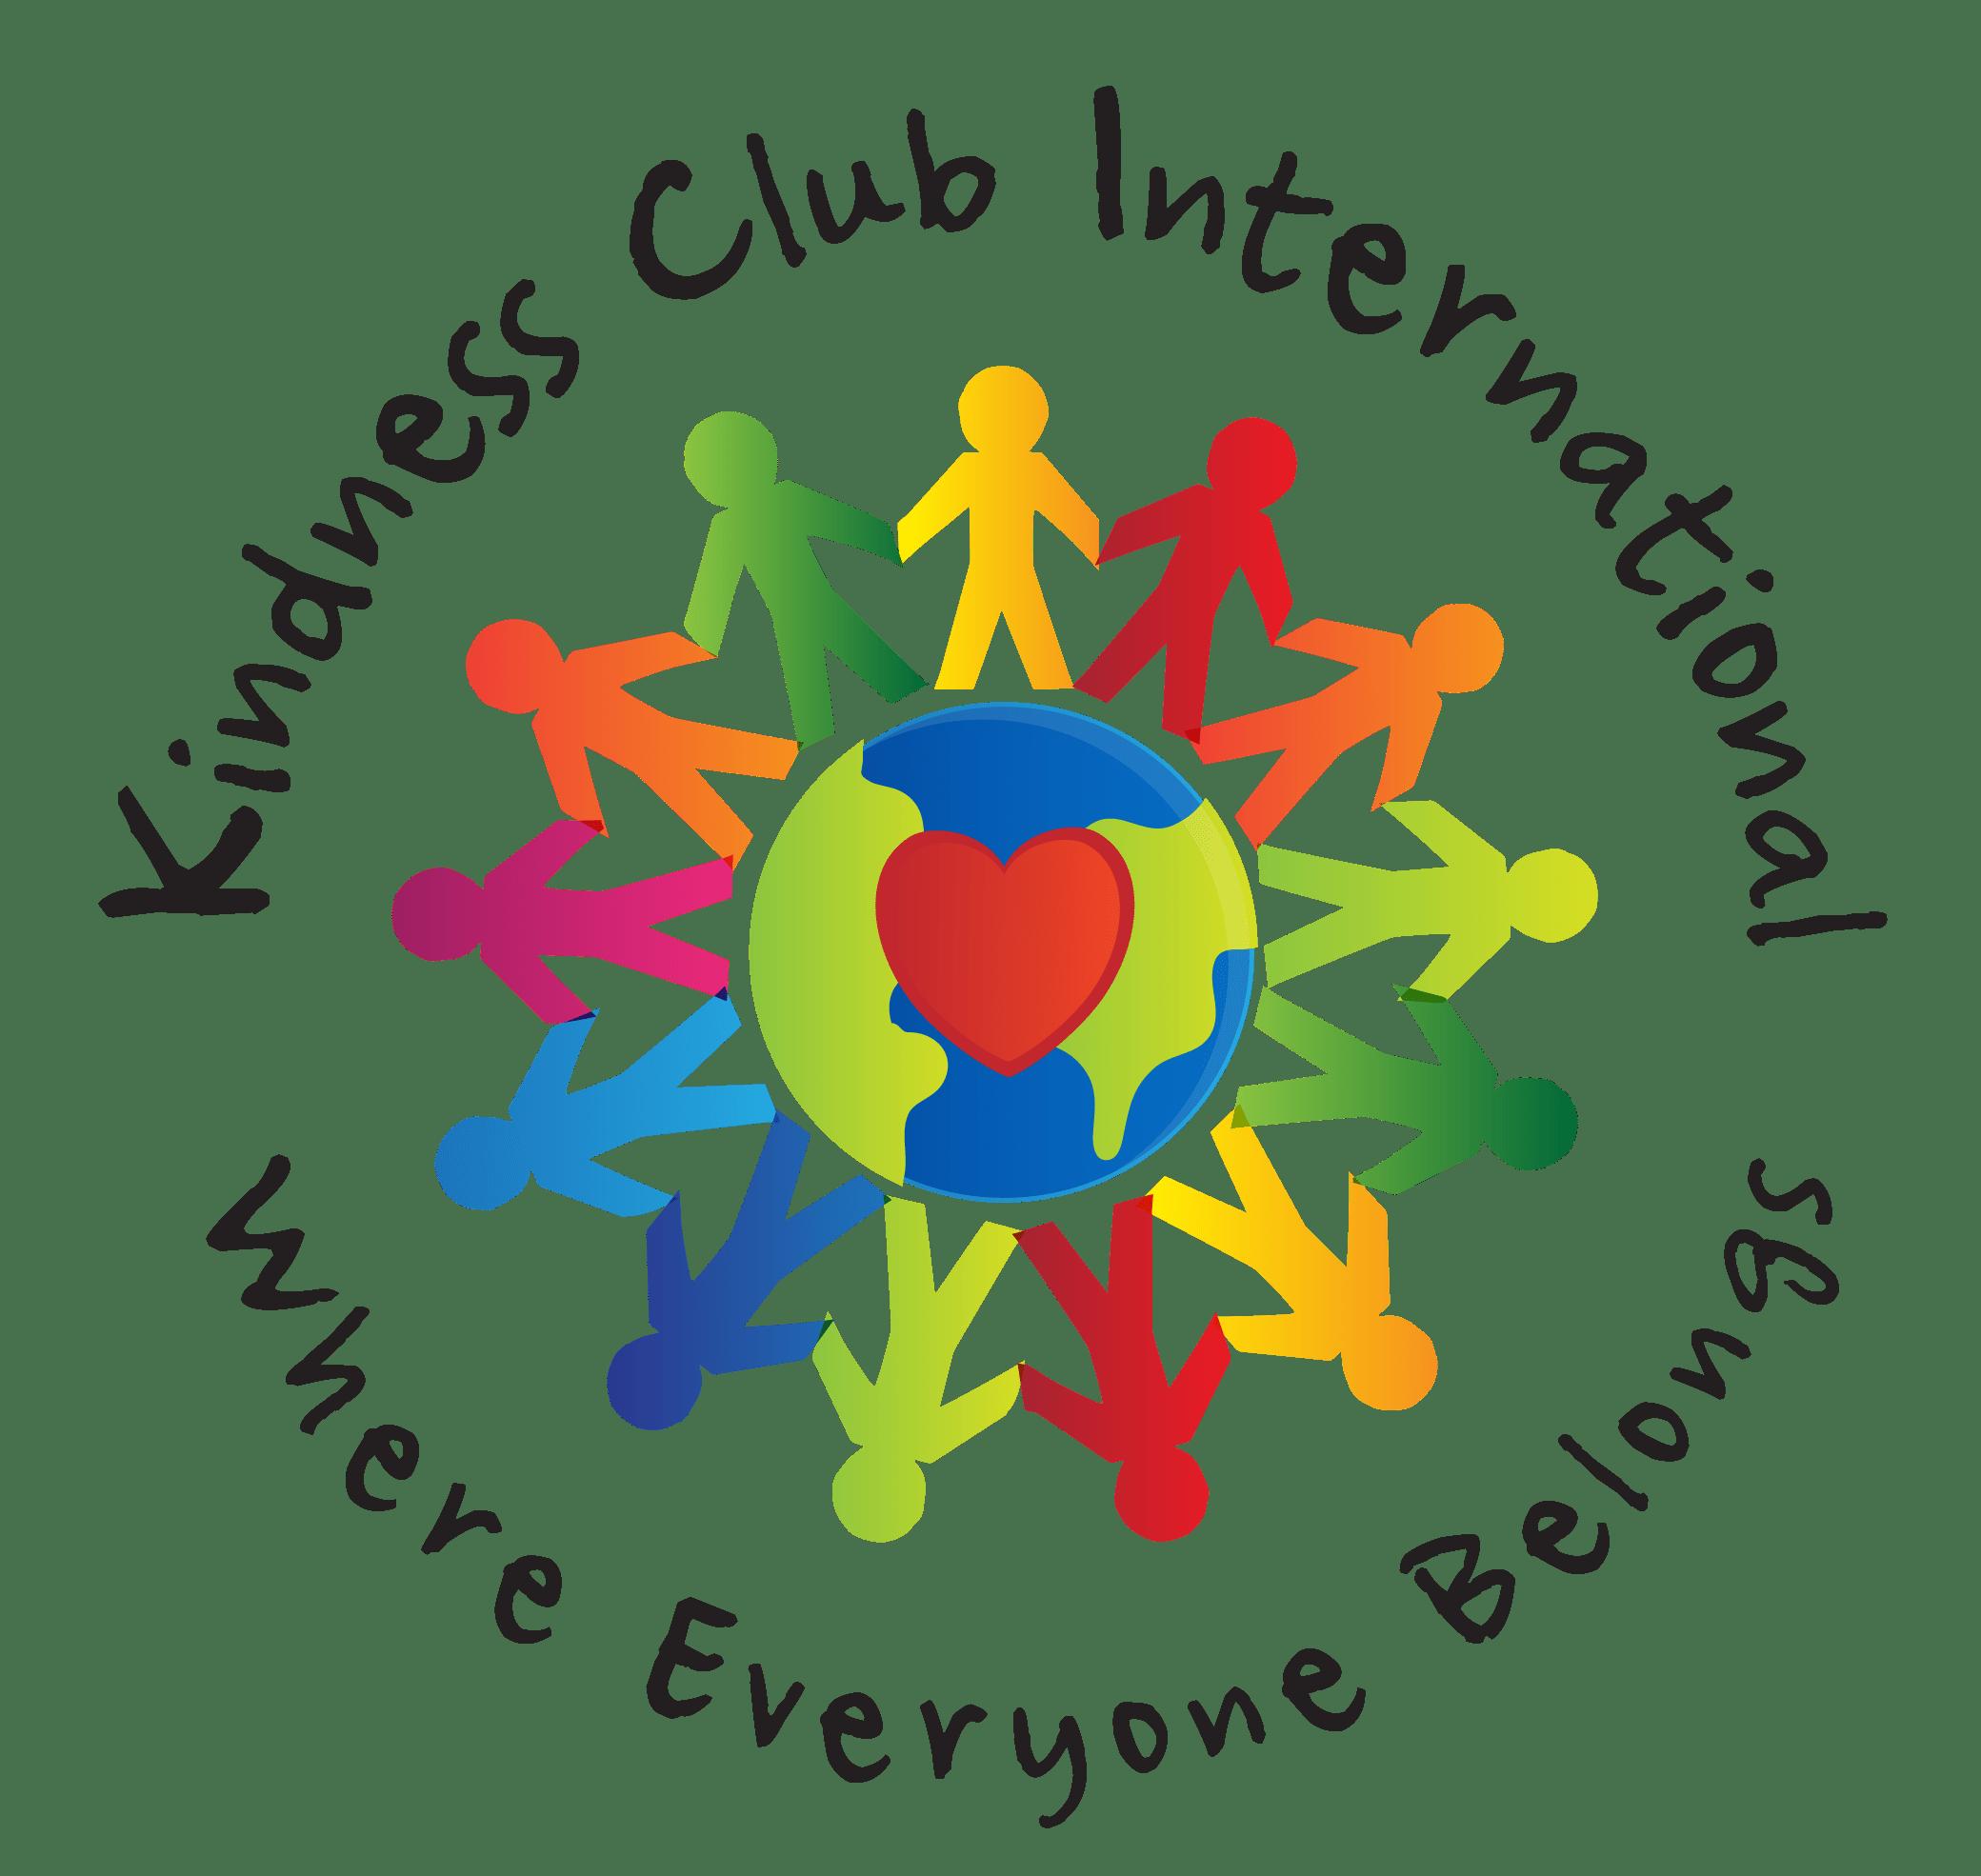 kindness club international where everyone belongs